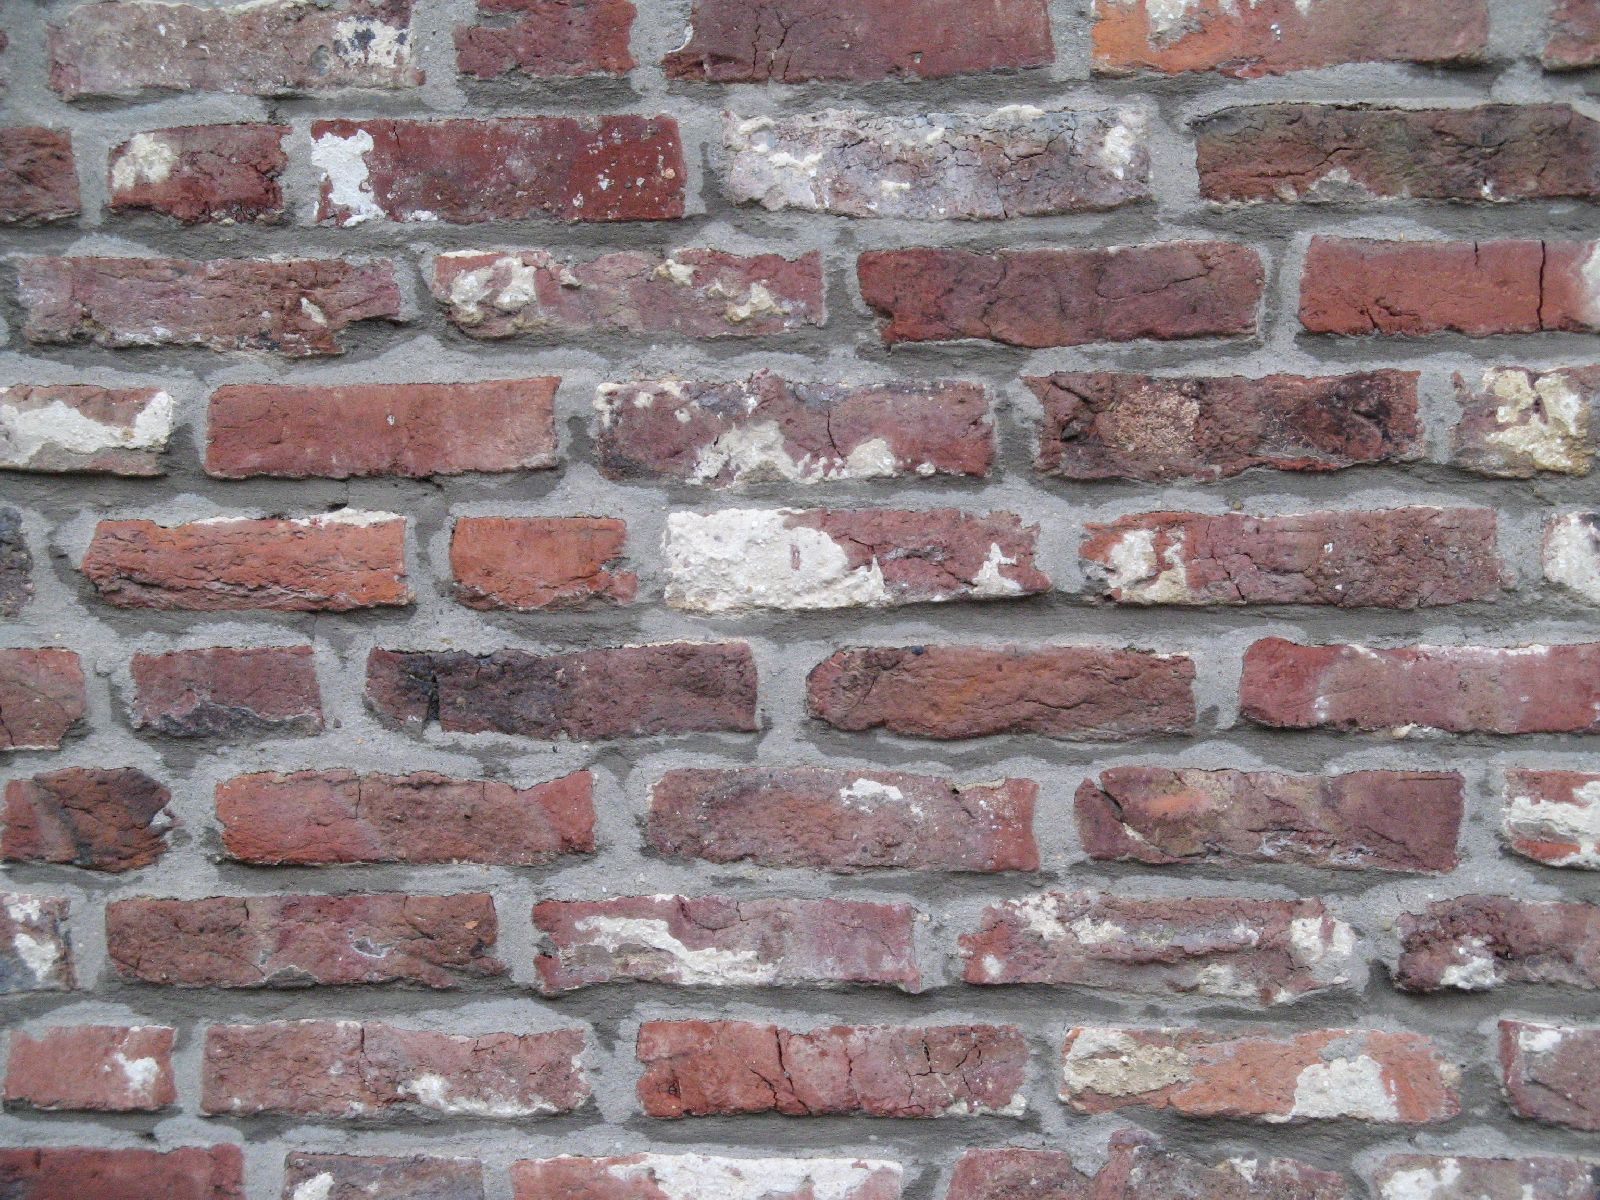 Brick_Texture_B_5869